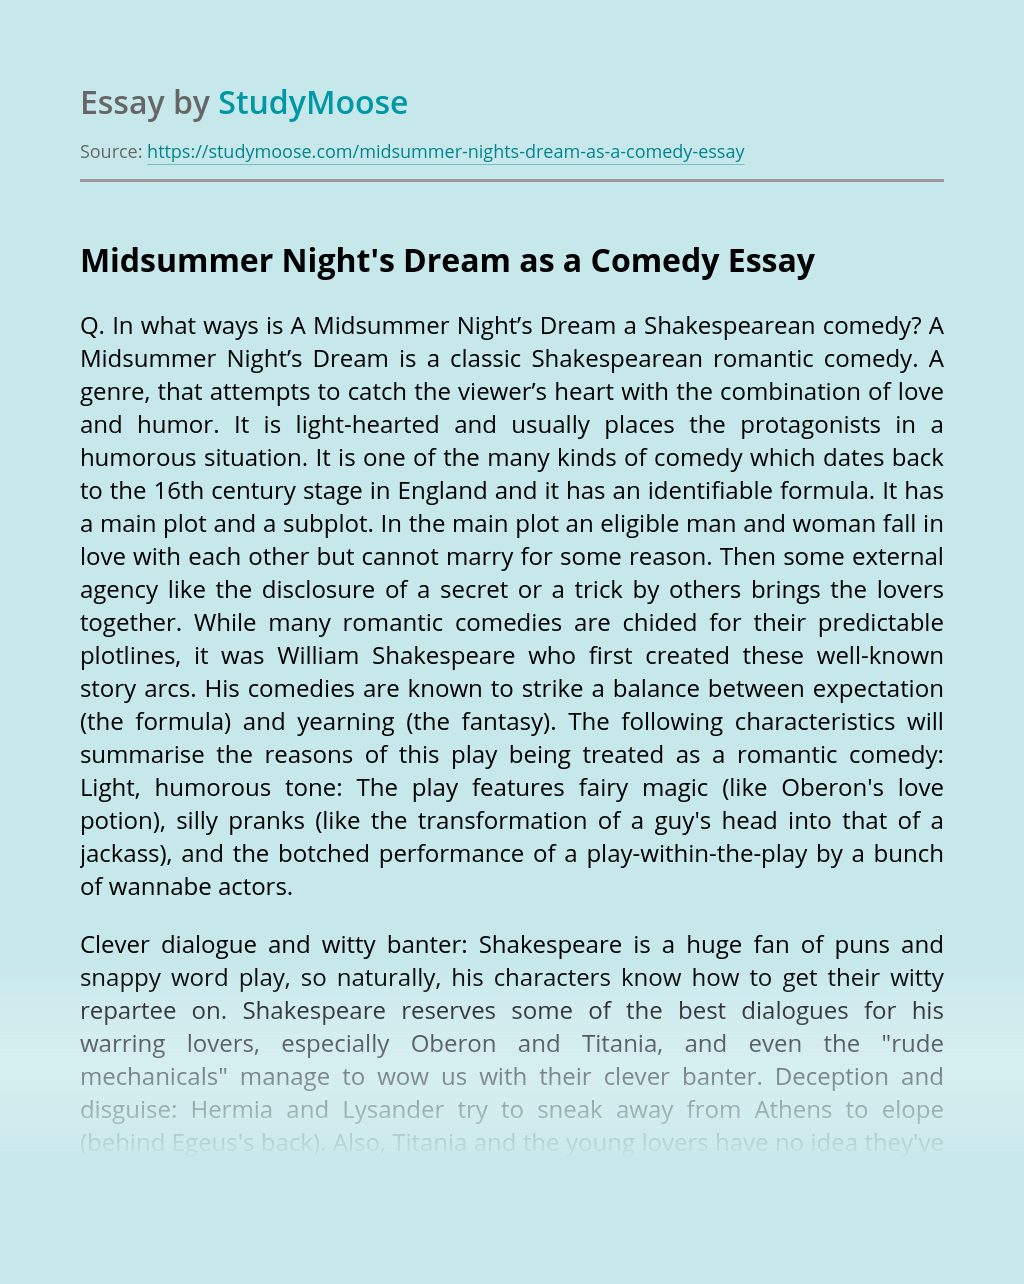 Midsummer Night's Dream as a Comedy